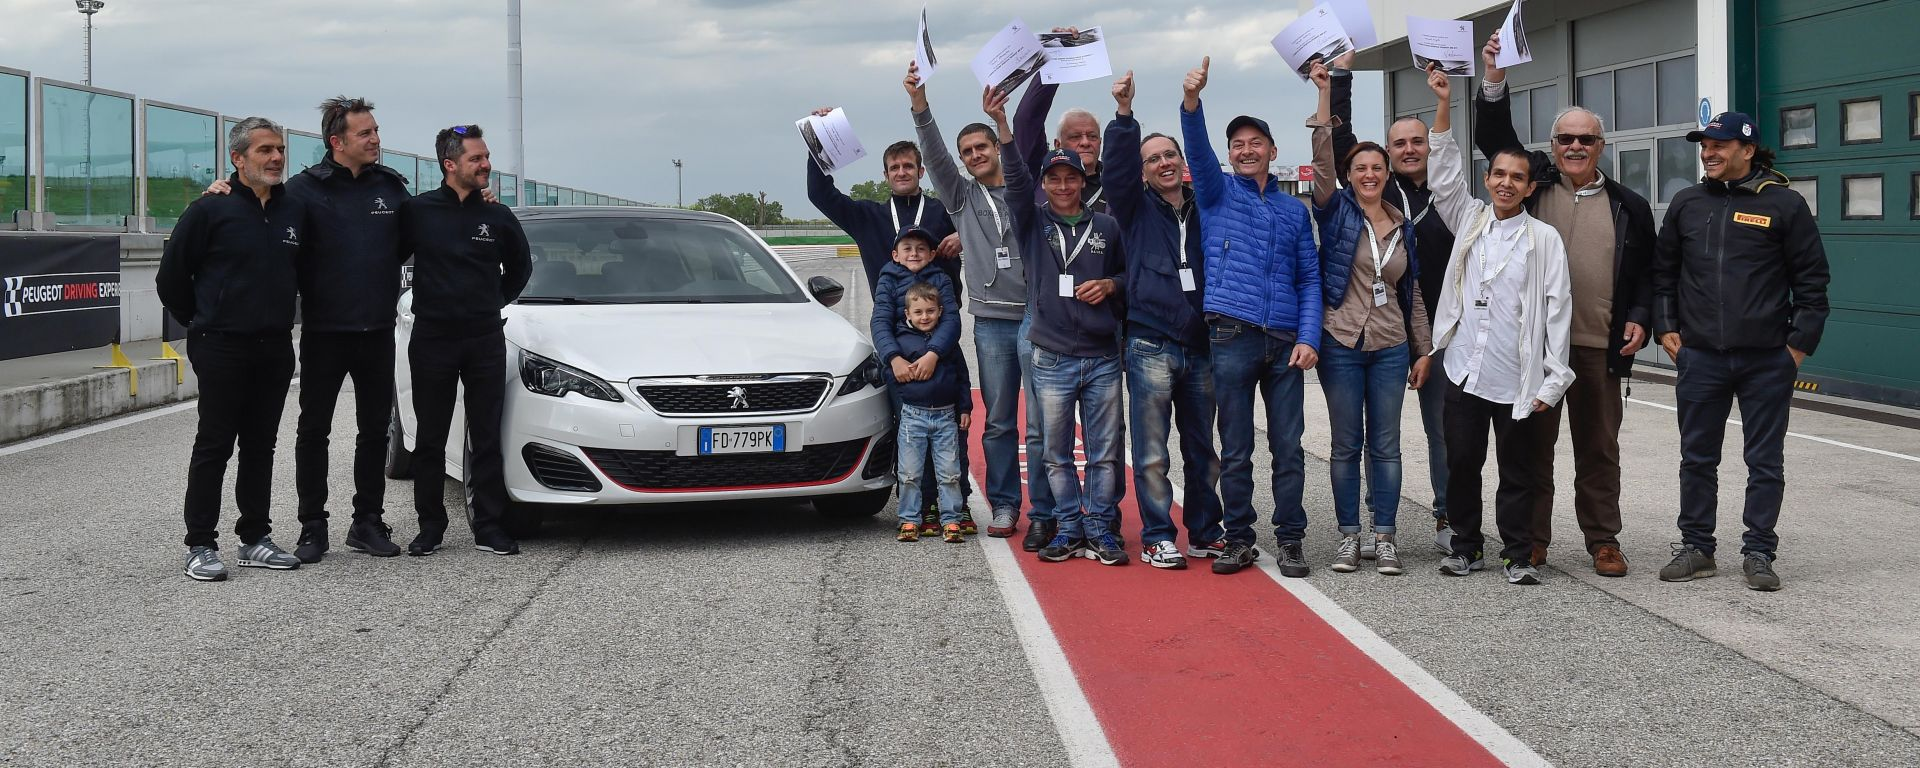 308 GTi by Peugeot Sport: i primi 12 clienti a Misano